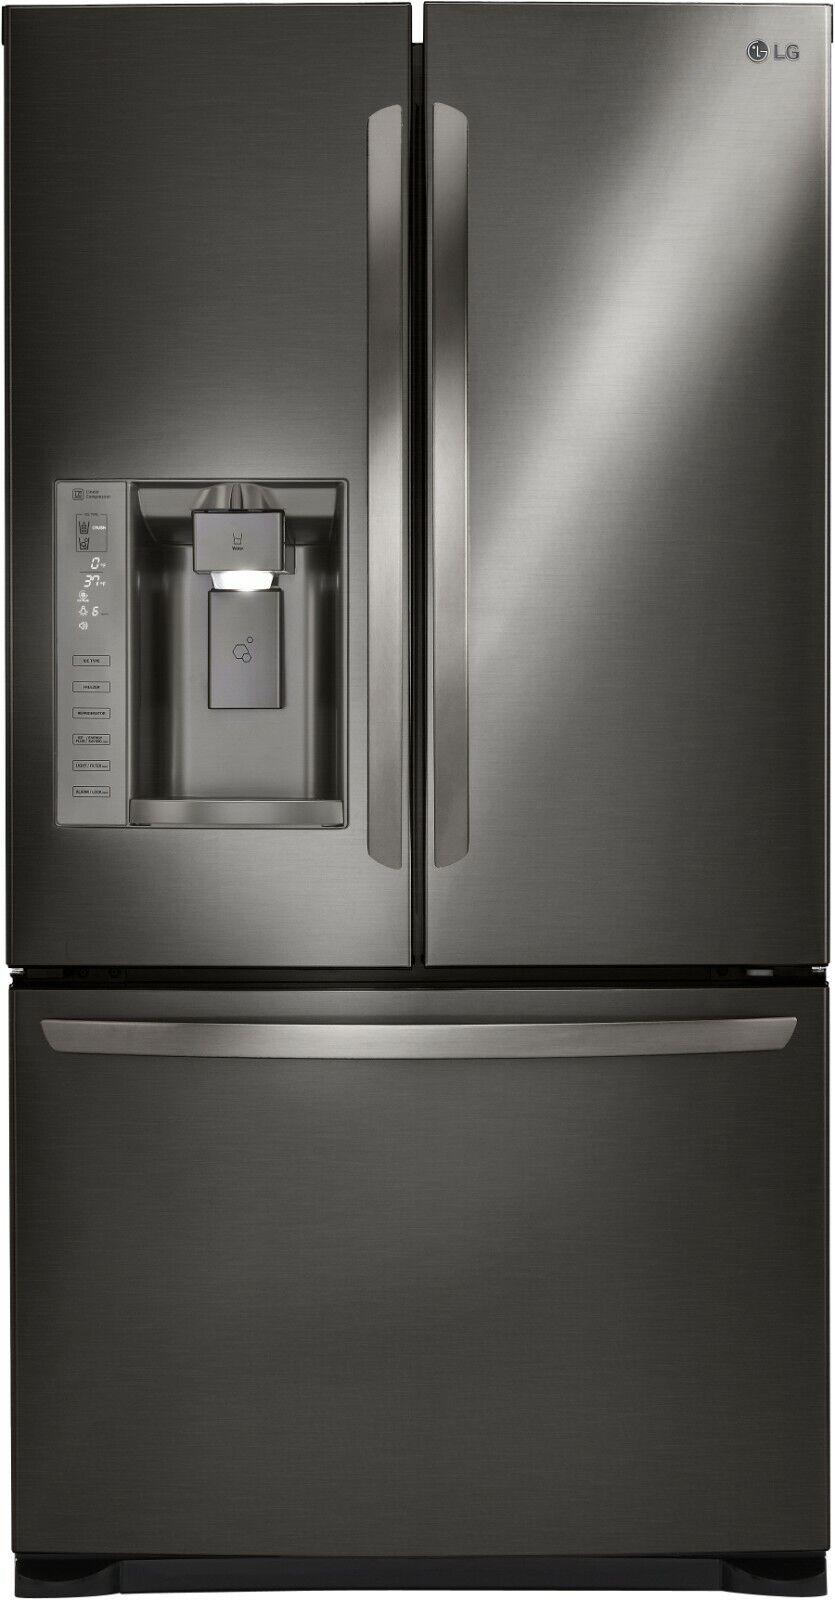 "LG LFX25973D 36"" Black Stainless Steel French Door Refrigera"